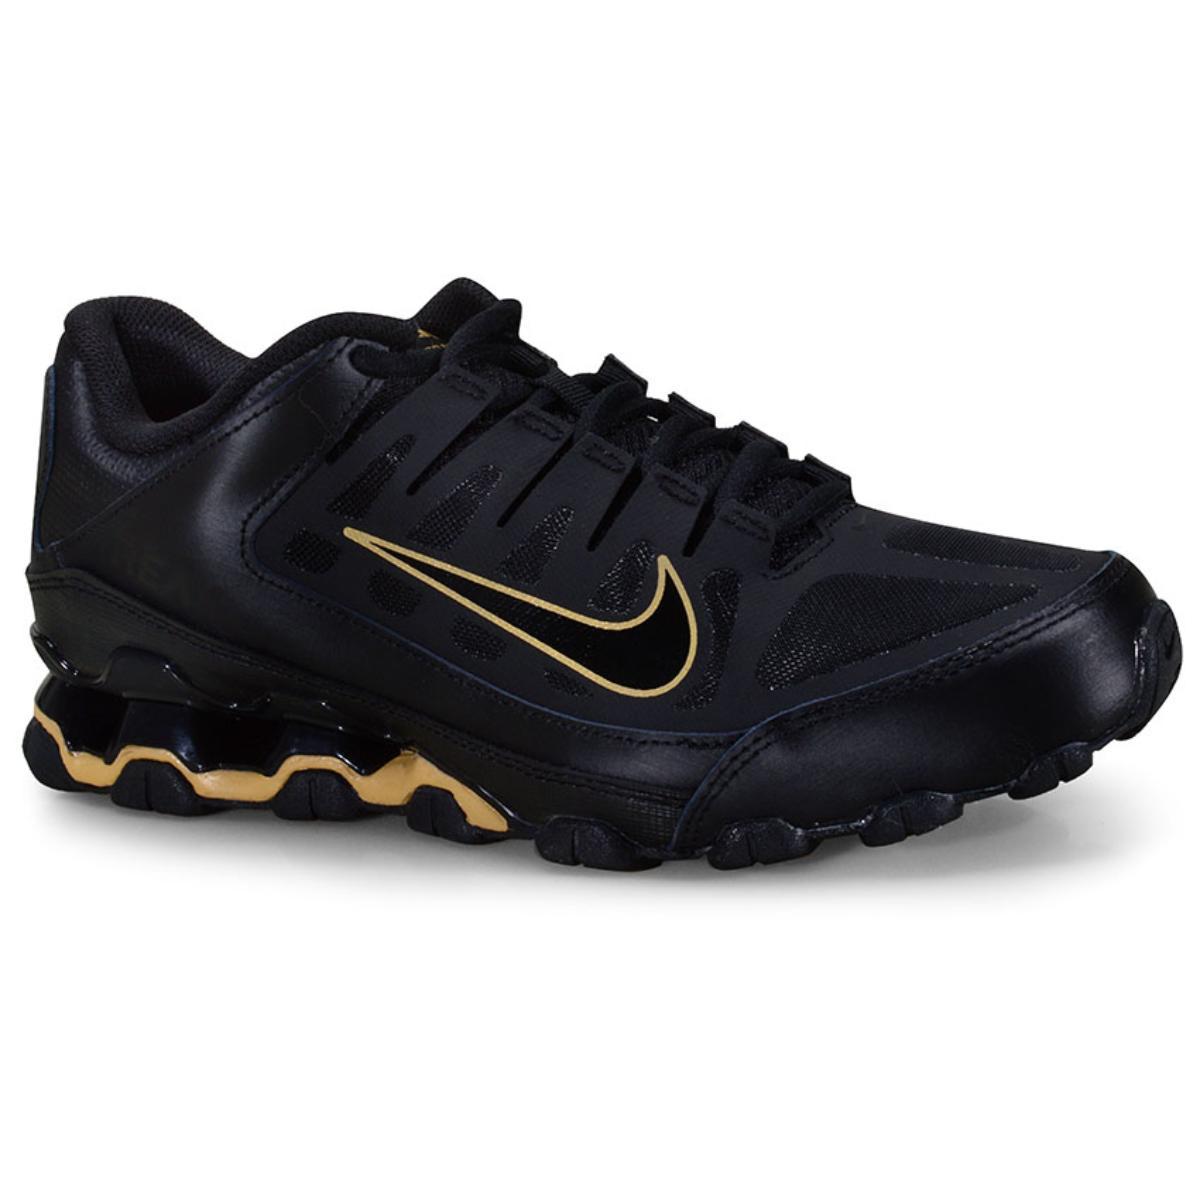 Tênis Masculino Nike 621716-020 Reax 8 tr Preto